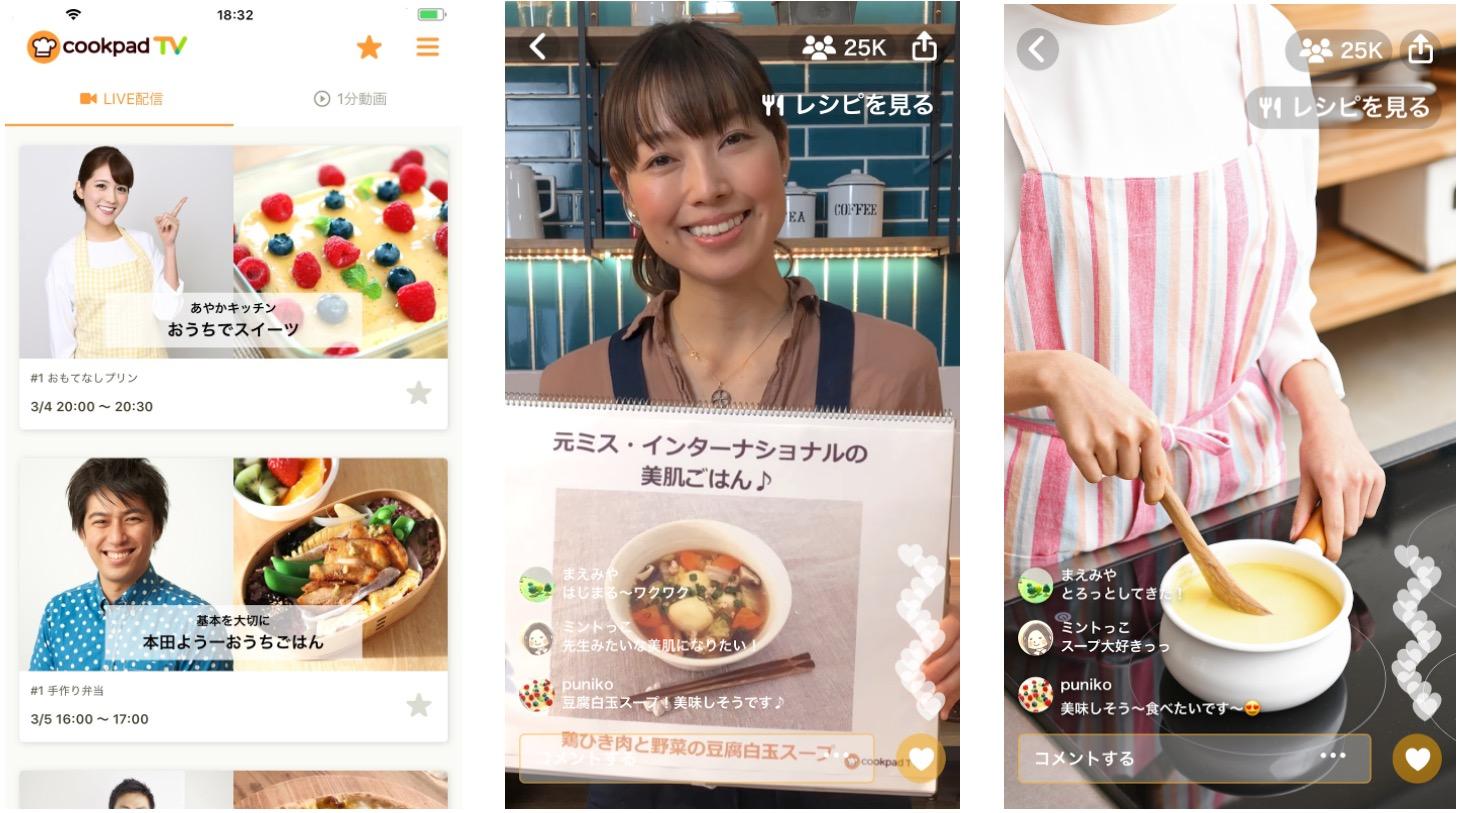 cookpadTVアプリ